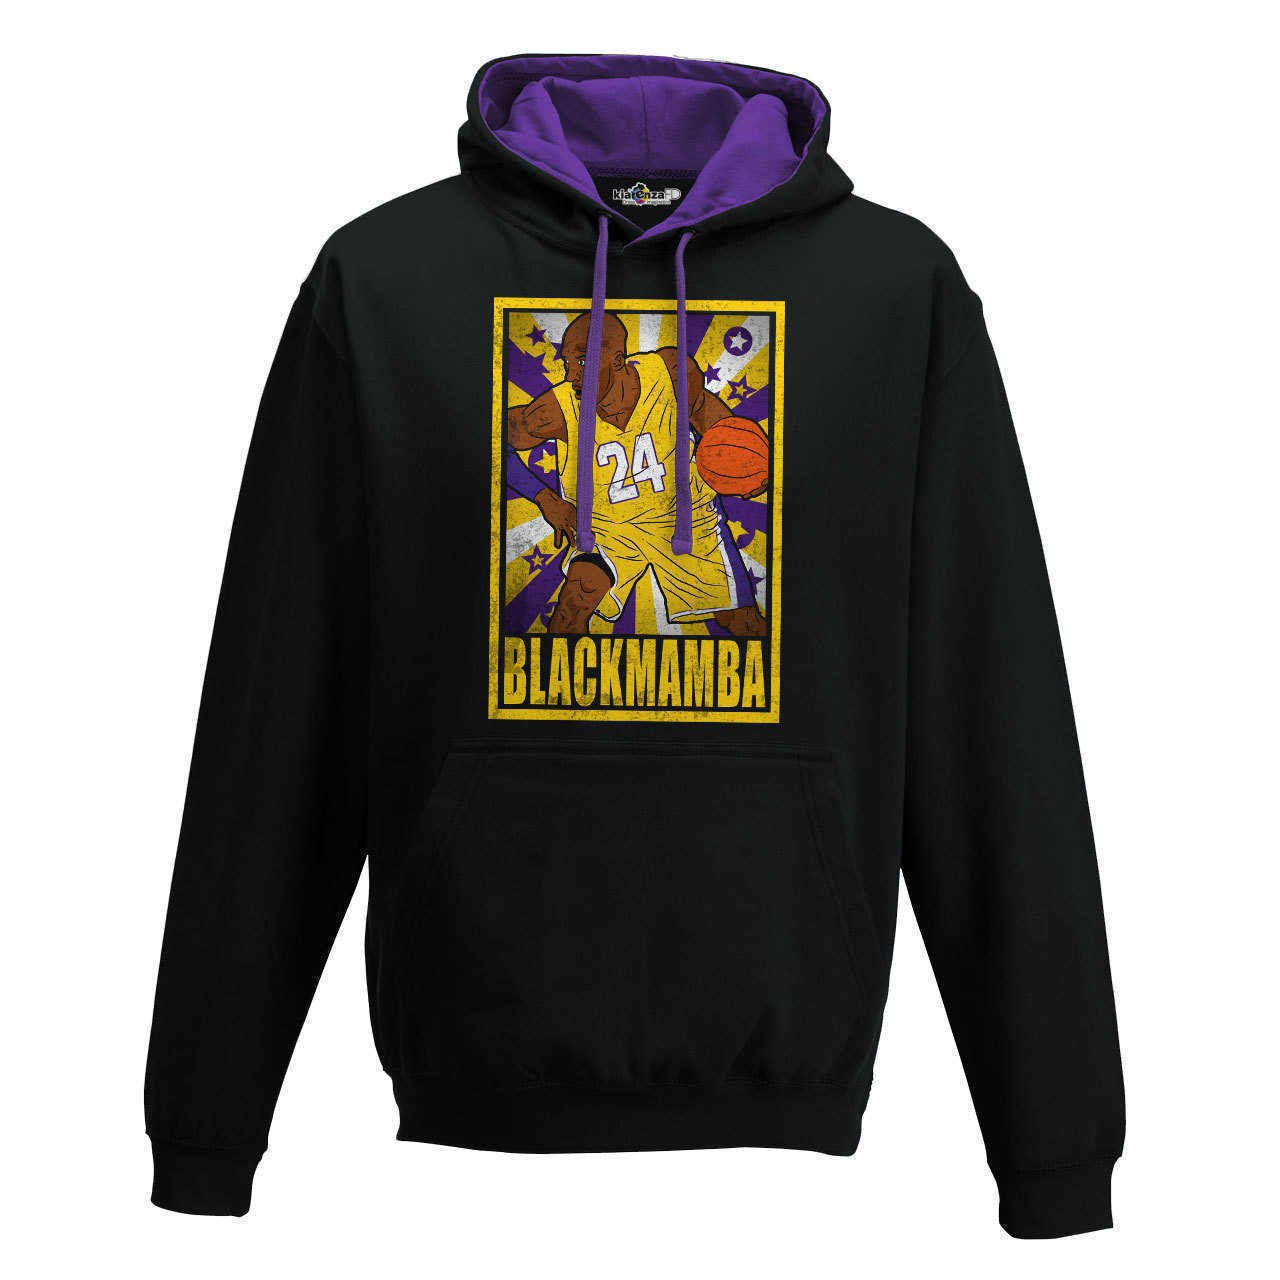 KiarenzaFD Sudadera Capucha Bico Baloncesto Vintage Parodia All Star Kobe Bryant Black Mamba 1: Amazon.es: Deportes y aire libre